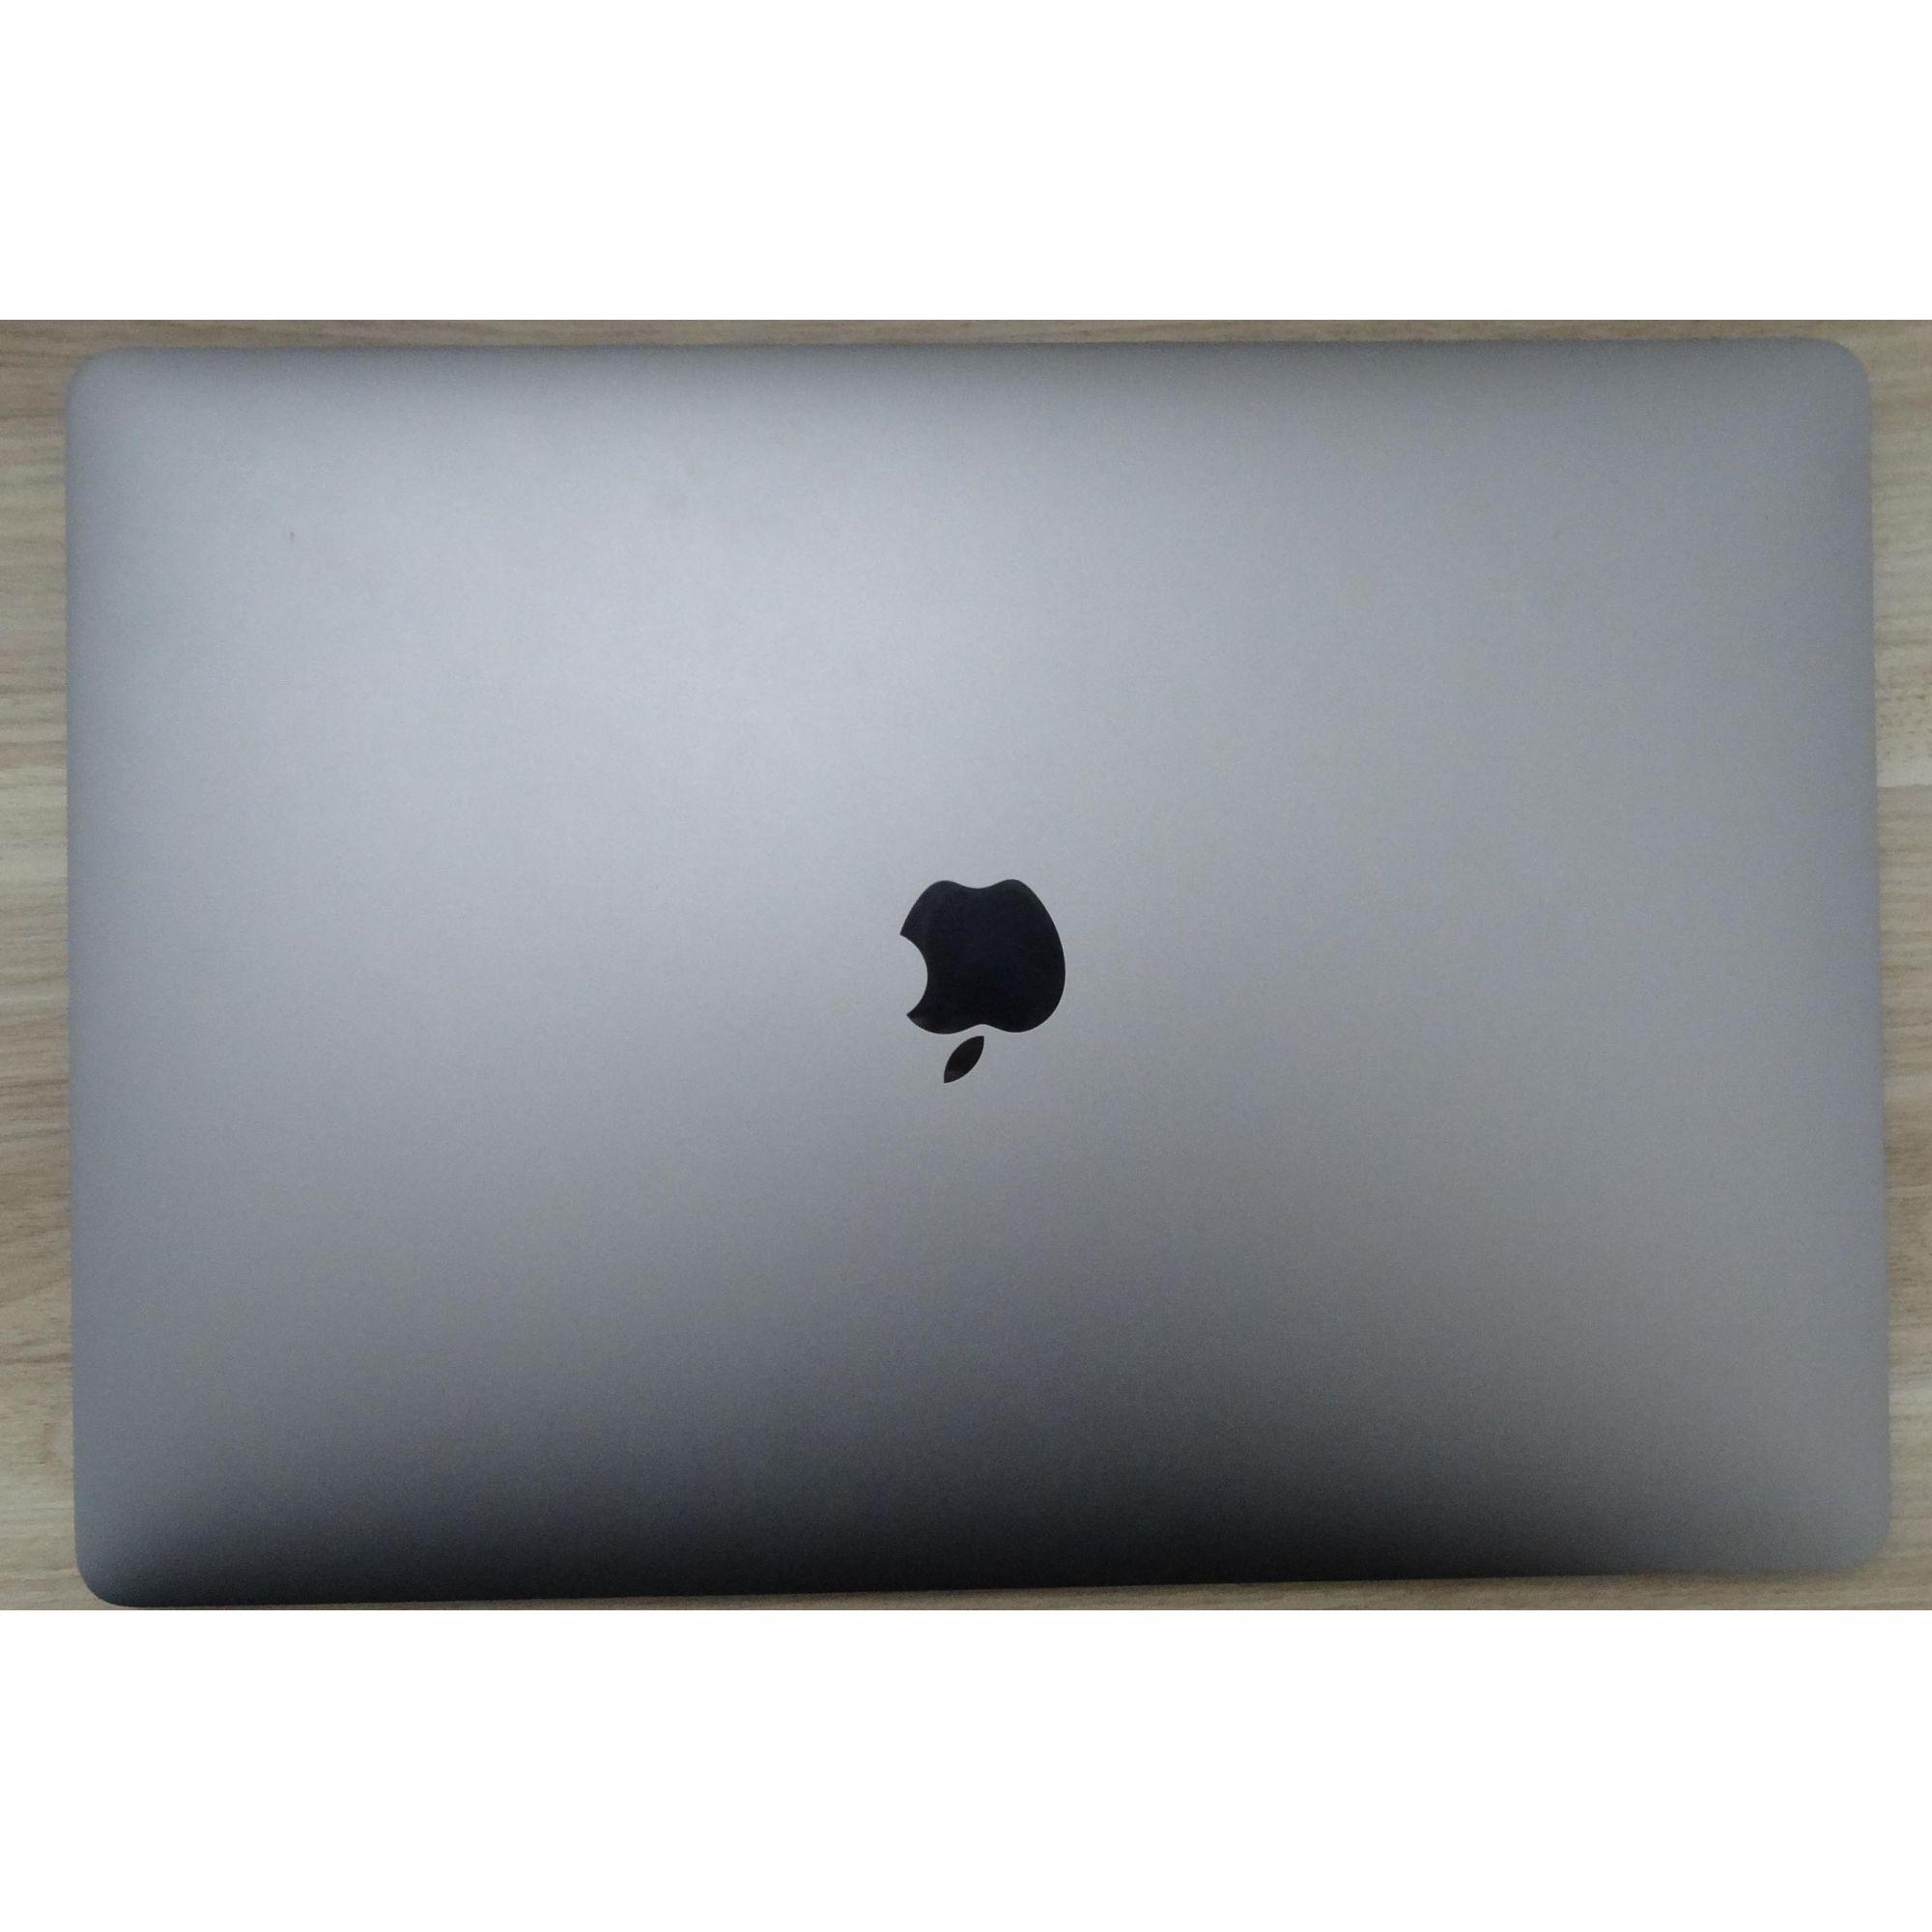 Macbook Pro Retina MPTT2LL/A 15.4'' Core i7 2.9GHz 16GB SSD-512GB (Não Enviamos)